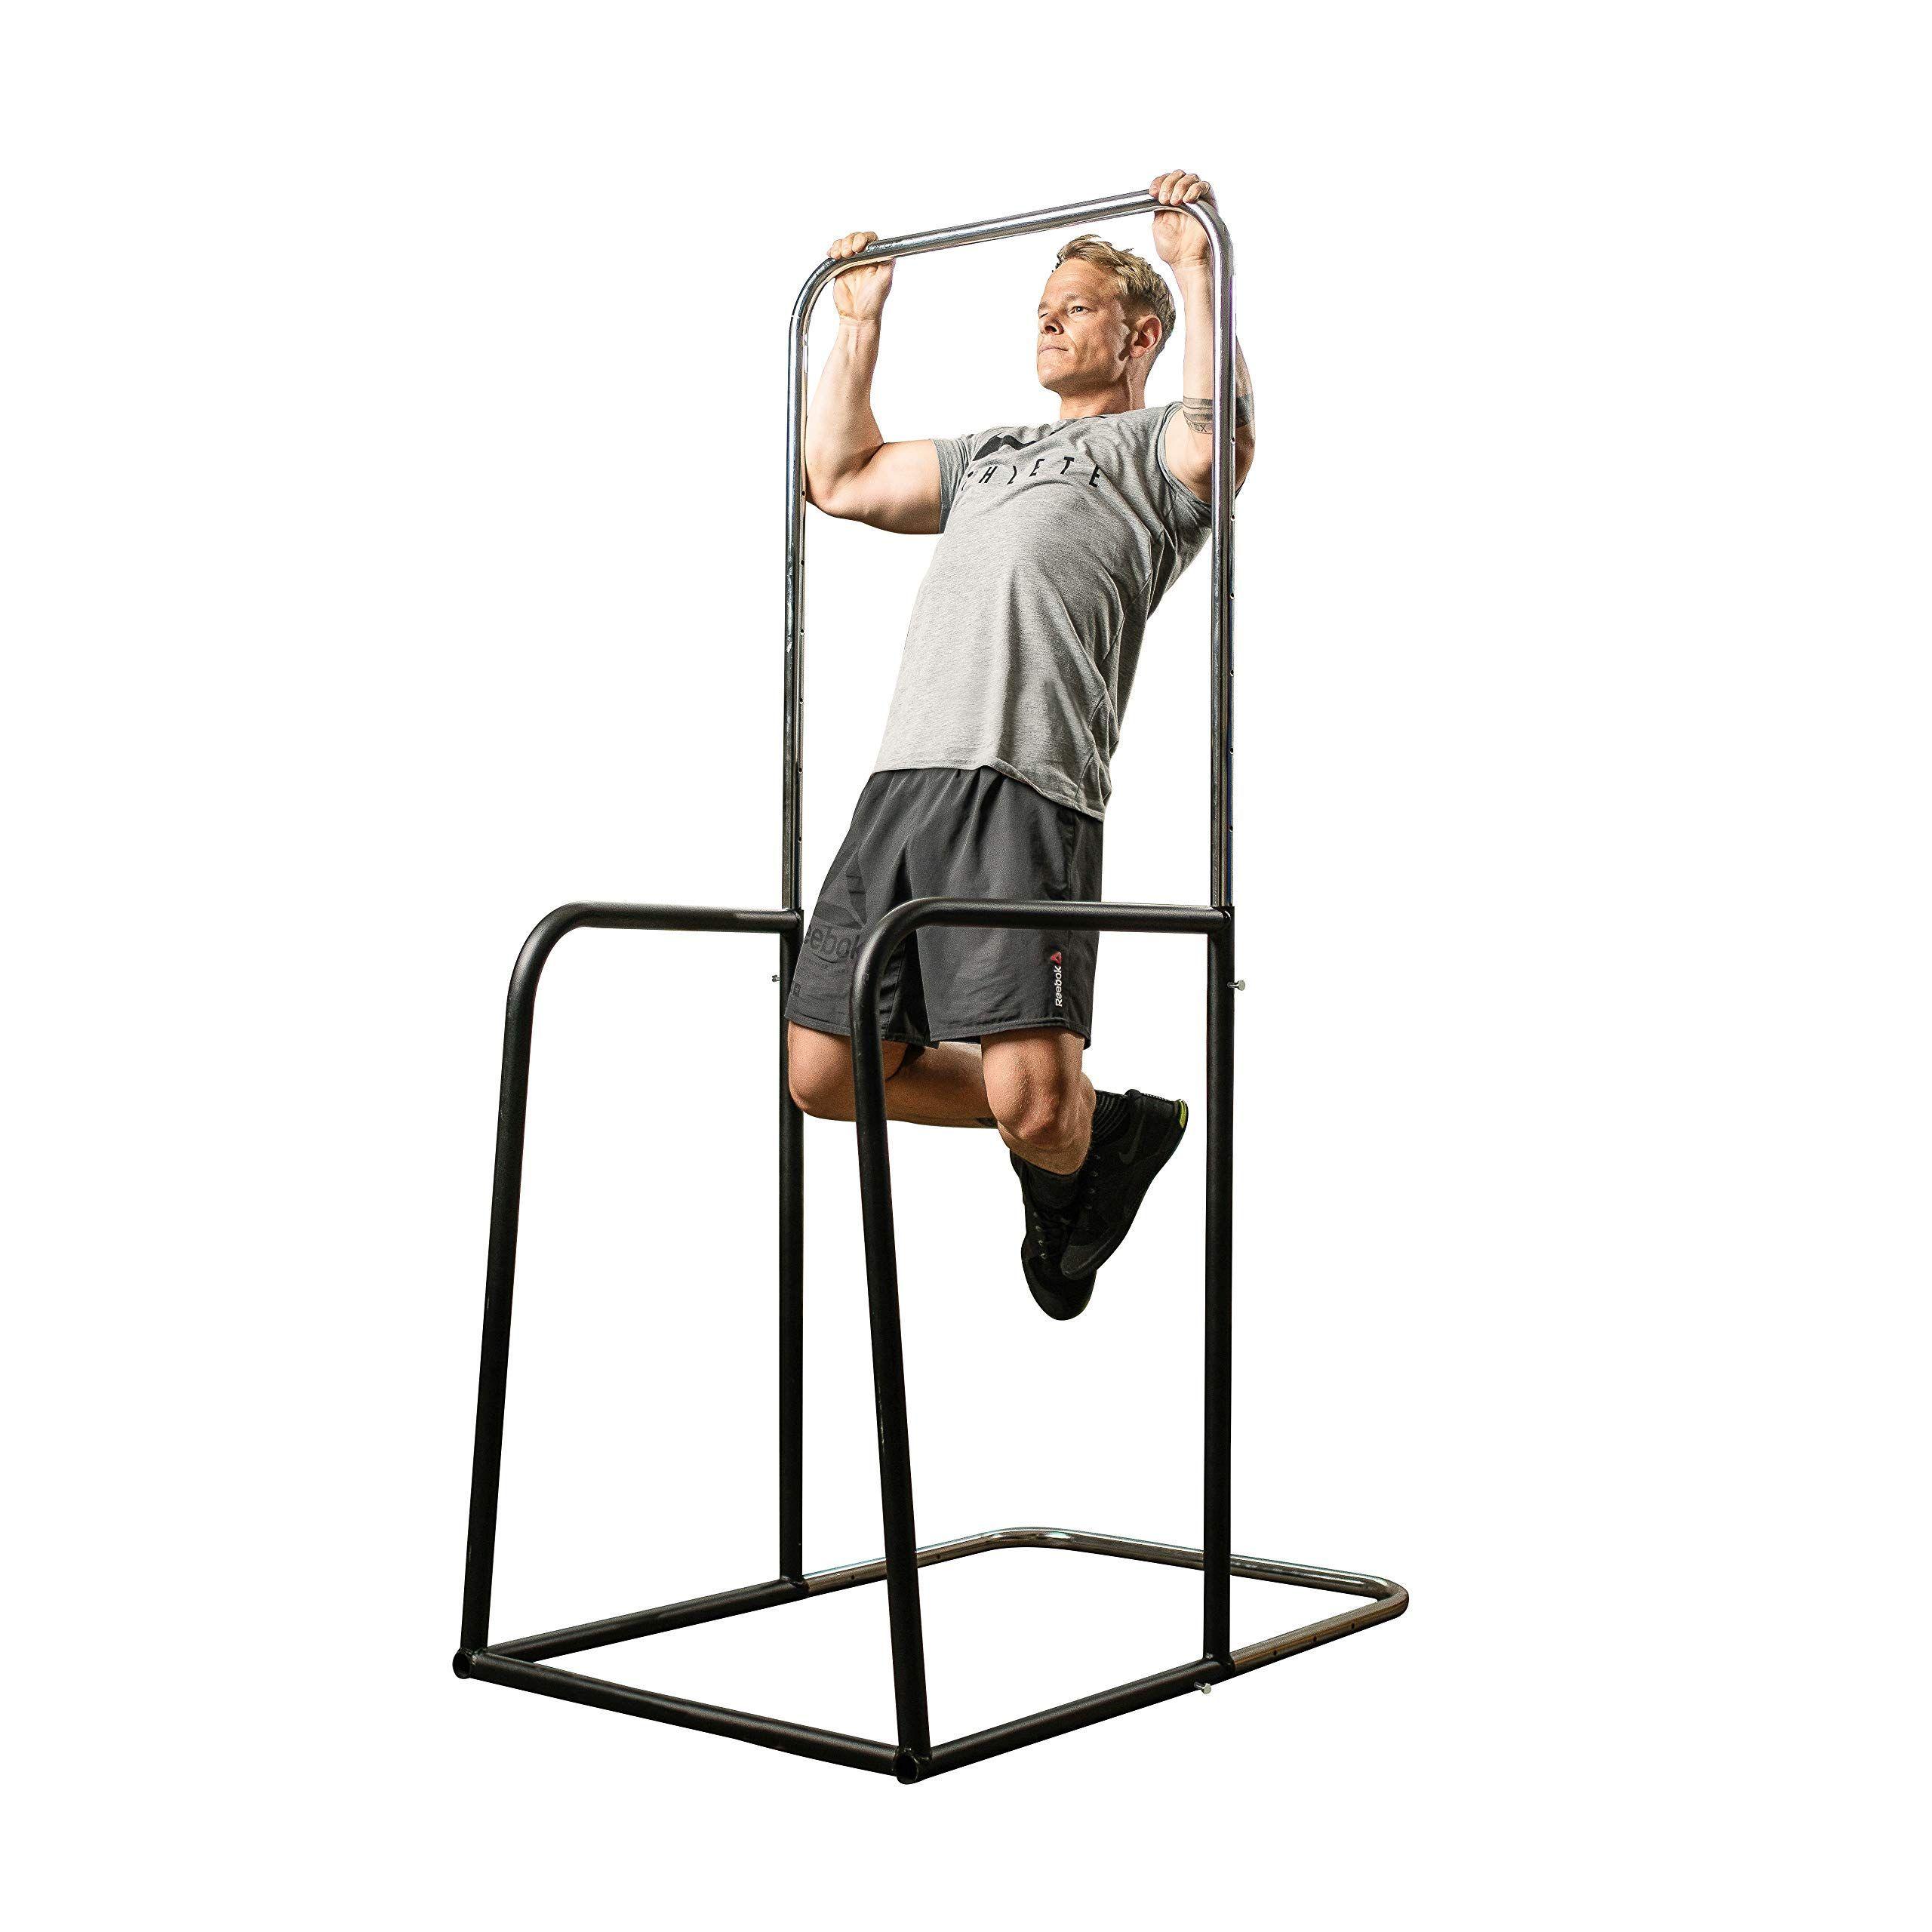 SportThieme Multifunktionale Fitnessstation u